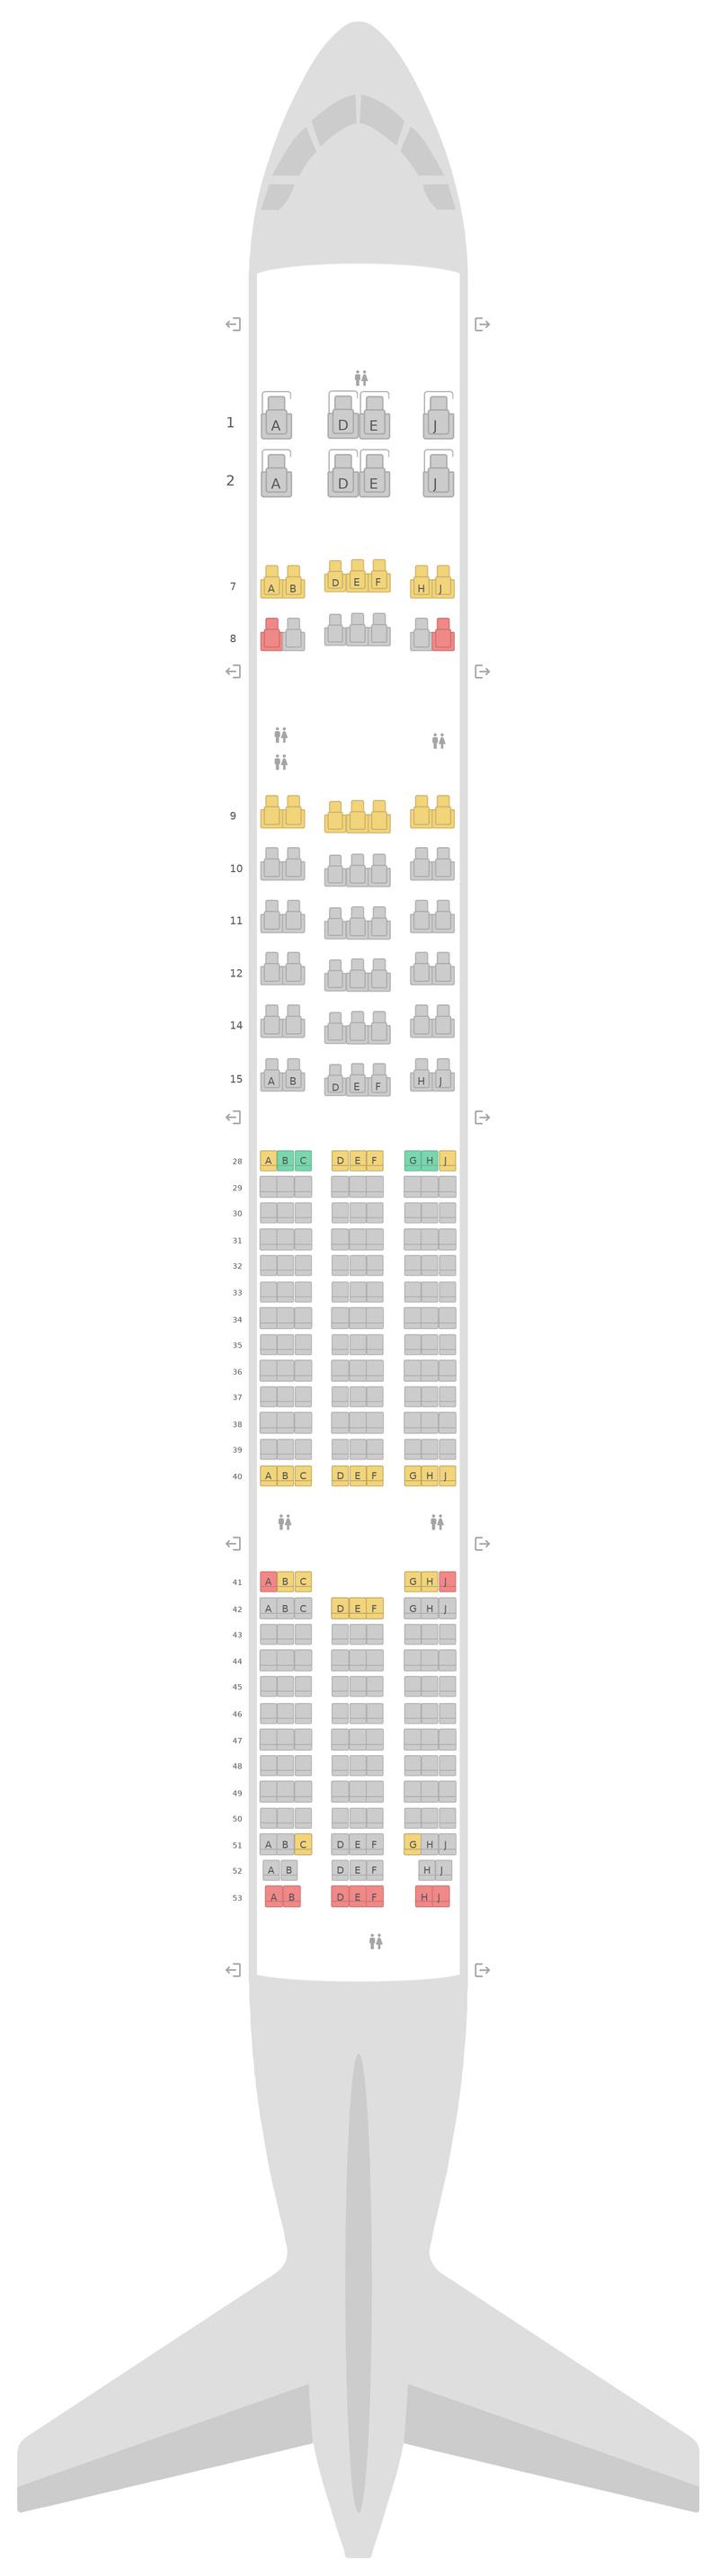 Seat Map Korean Air Boeing 777-300ER (77W) v1